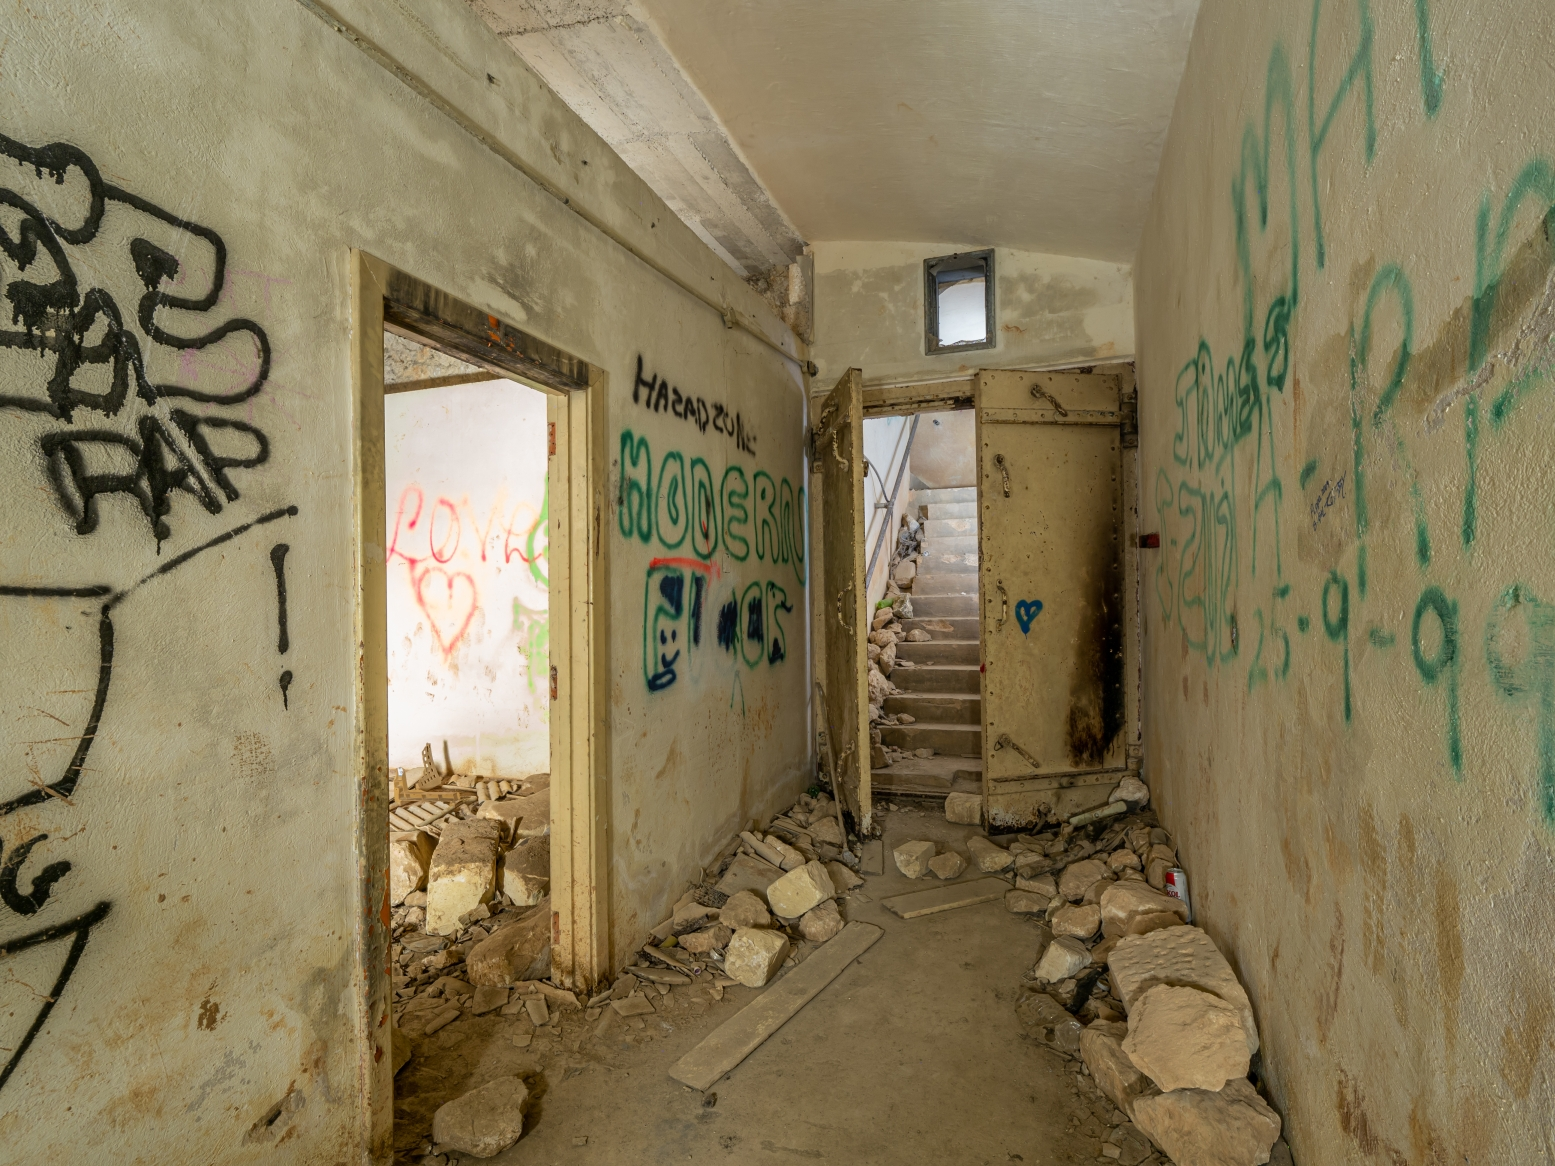 Atomschutzbunker (Kalter Krieg)